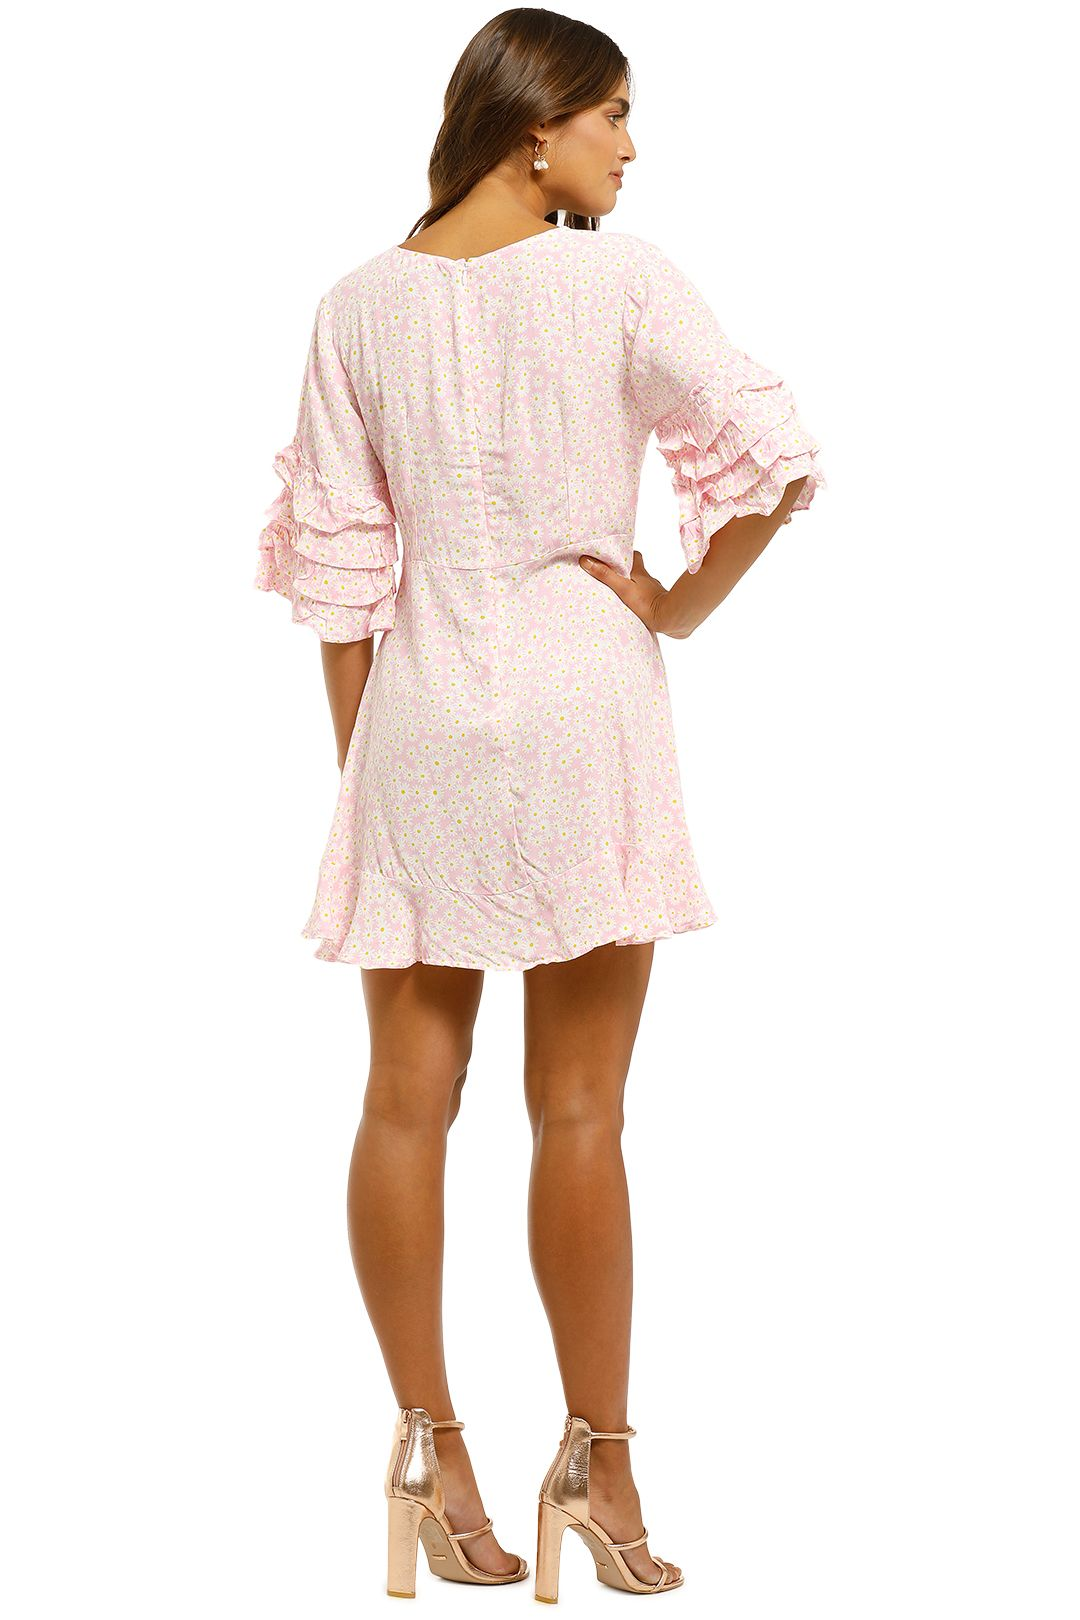 Faithfull-Serafina-Mini-Dress-Dusty-Floral-Print-Back